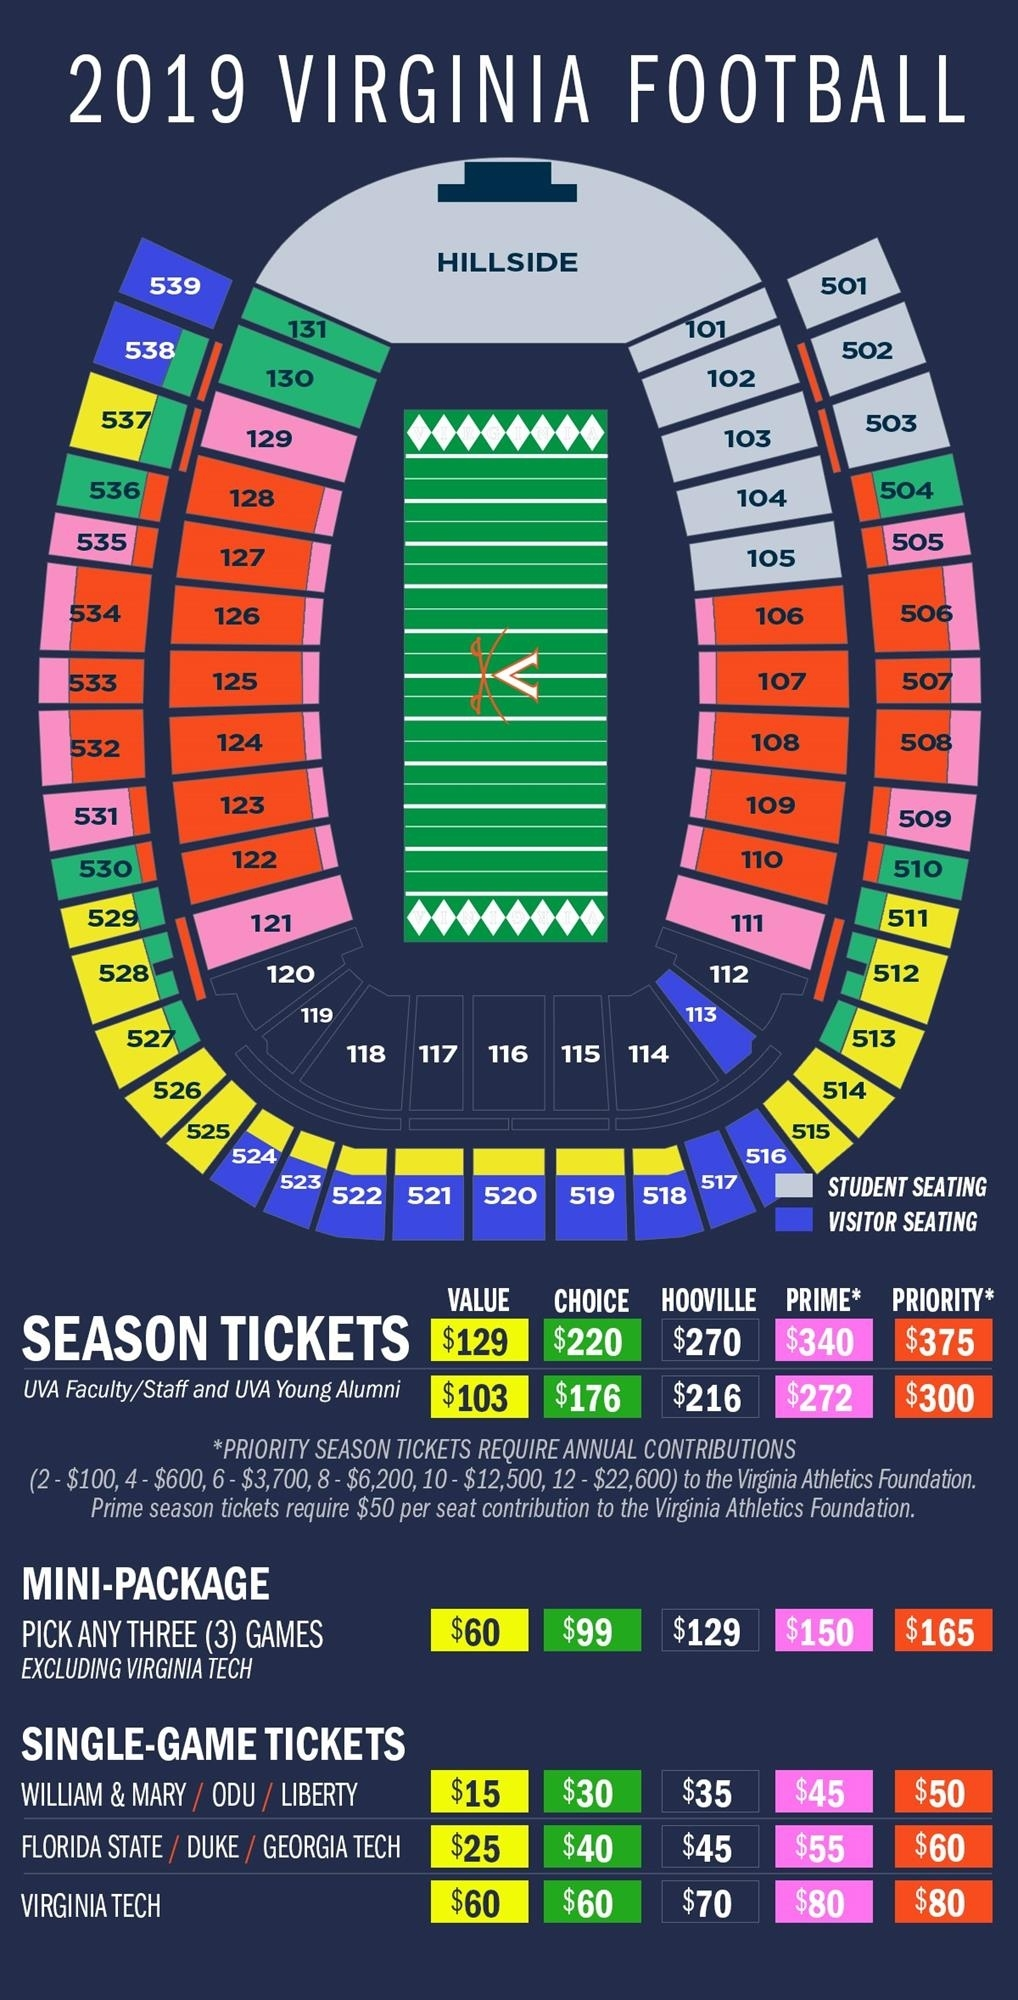 2019 Football Ticket Information - University Of Virginia inside Super Bowl Stadium 2019 Seating Chart